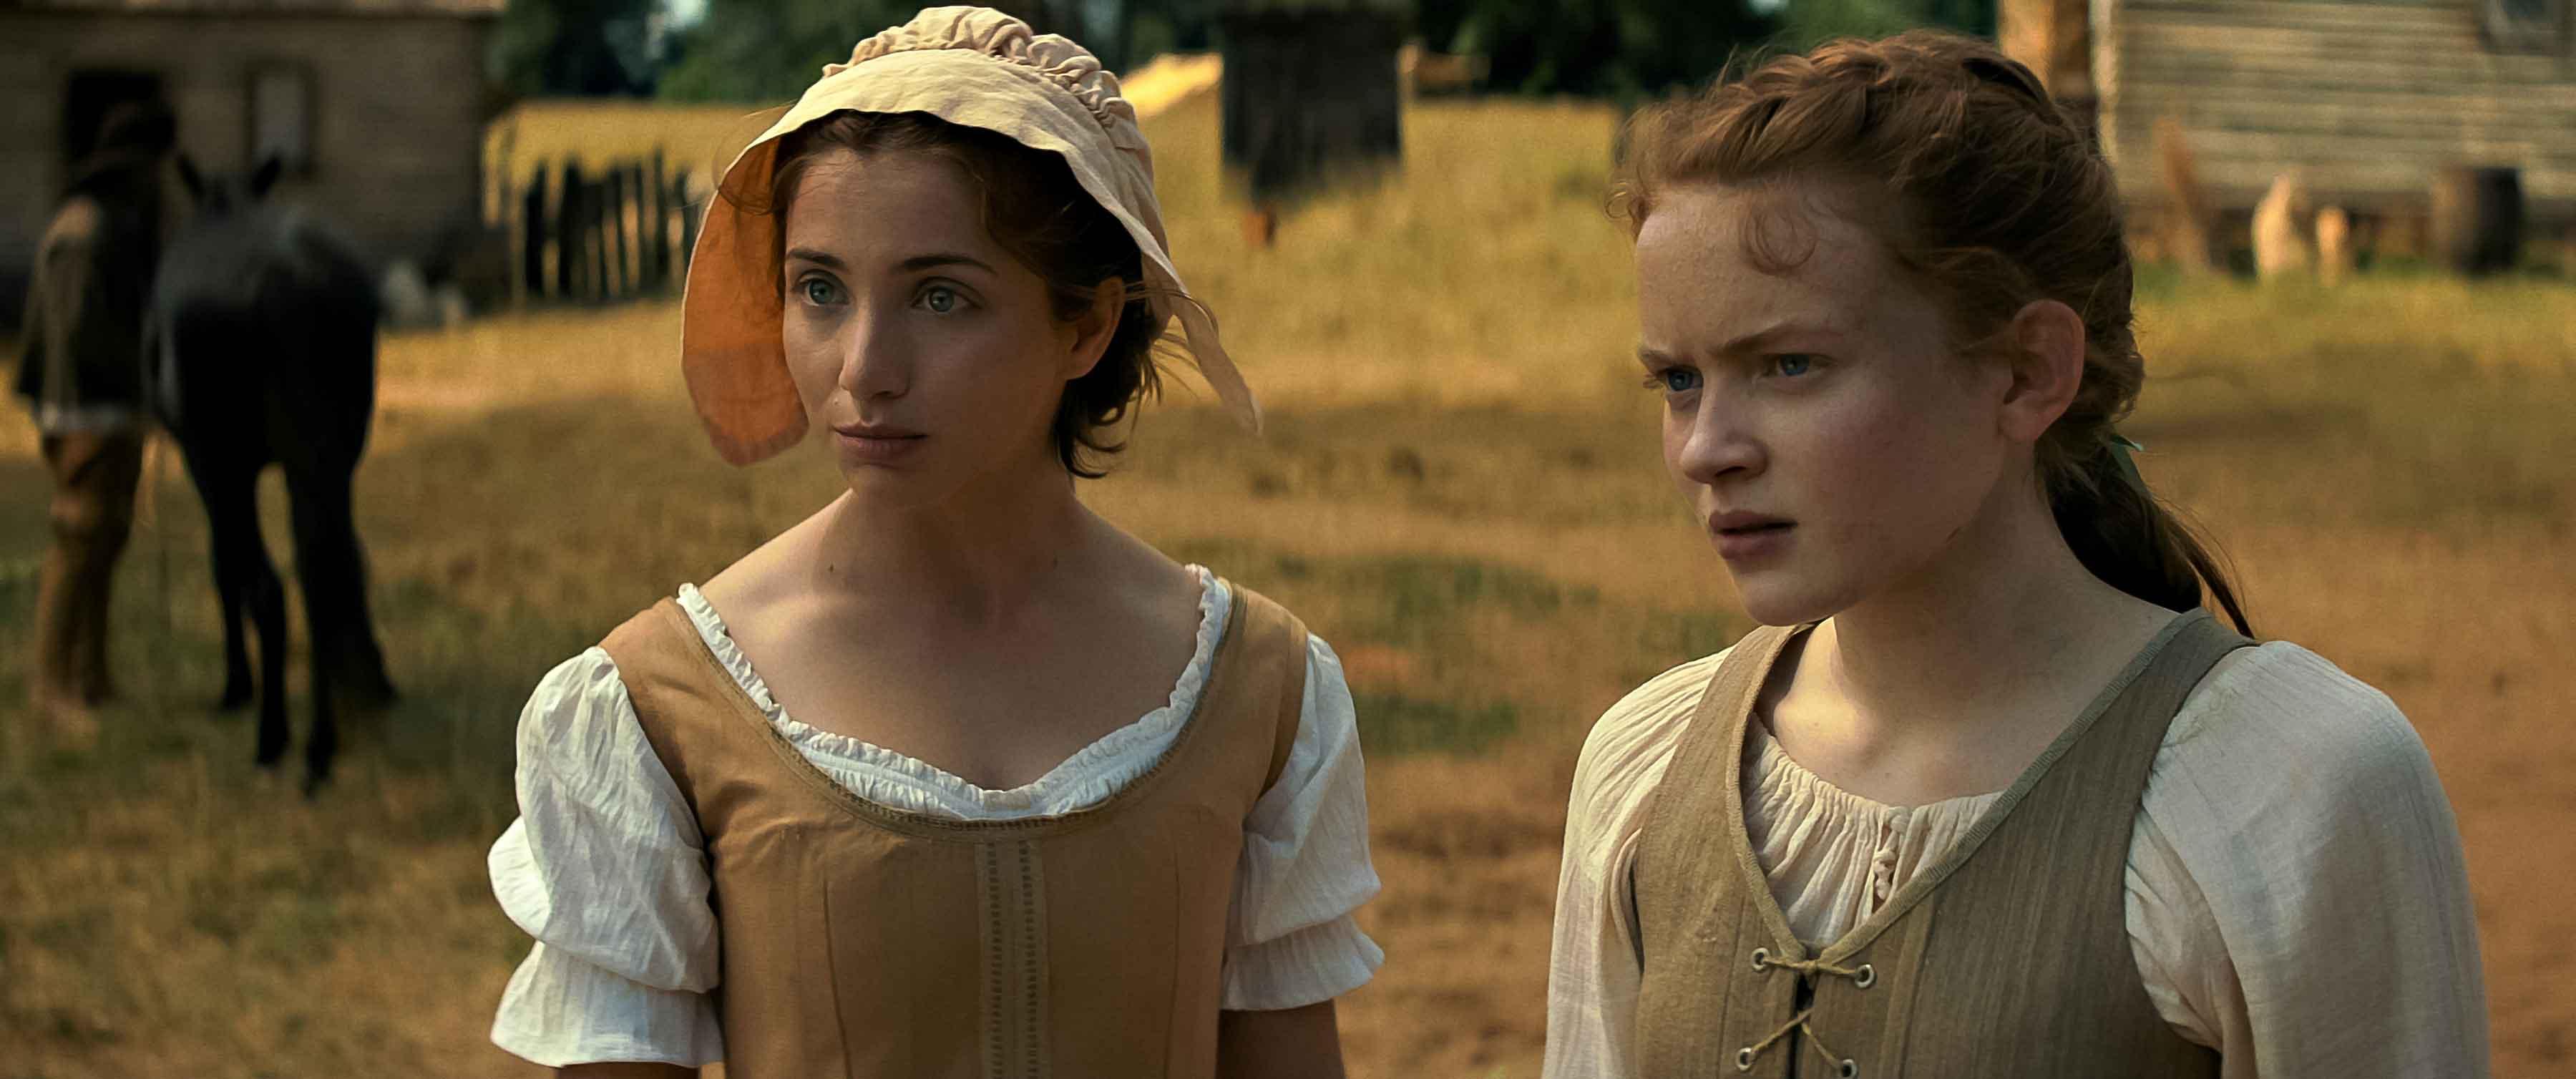 Emily Rudd e Sadie Sink